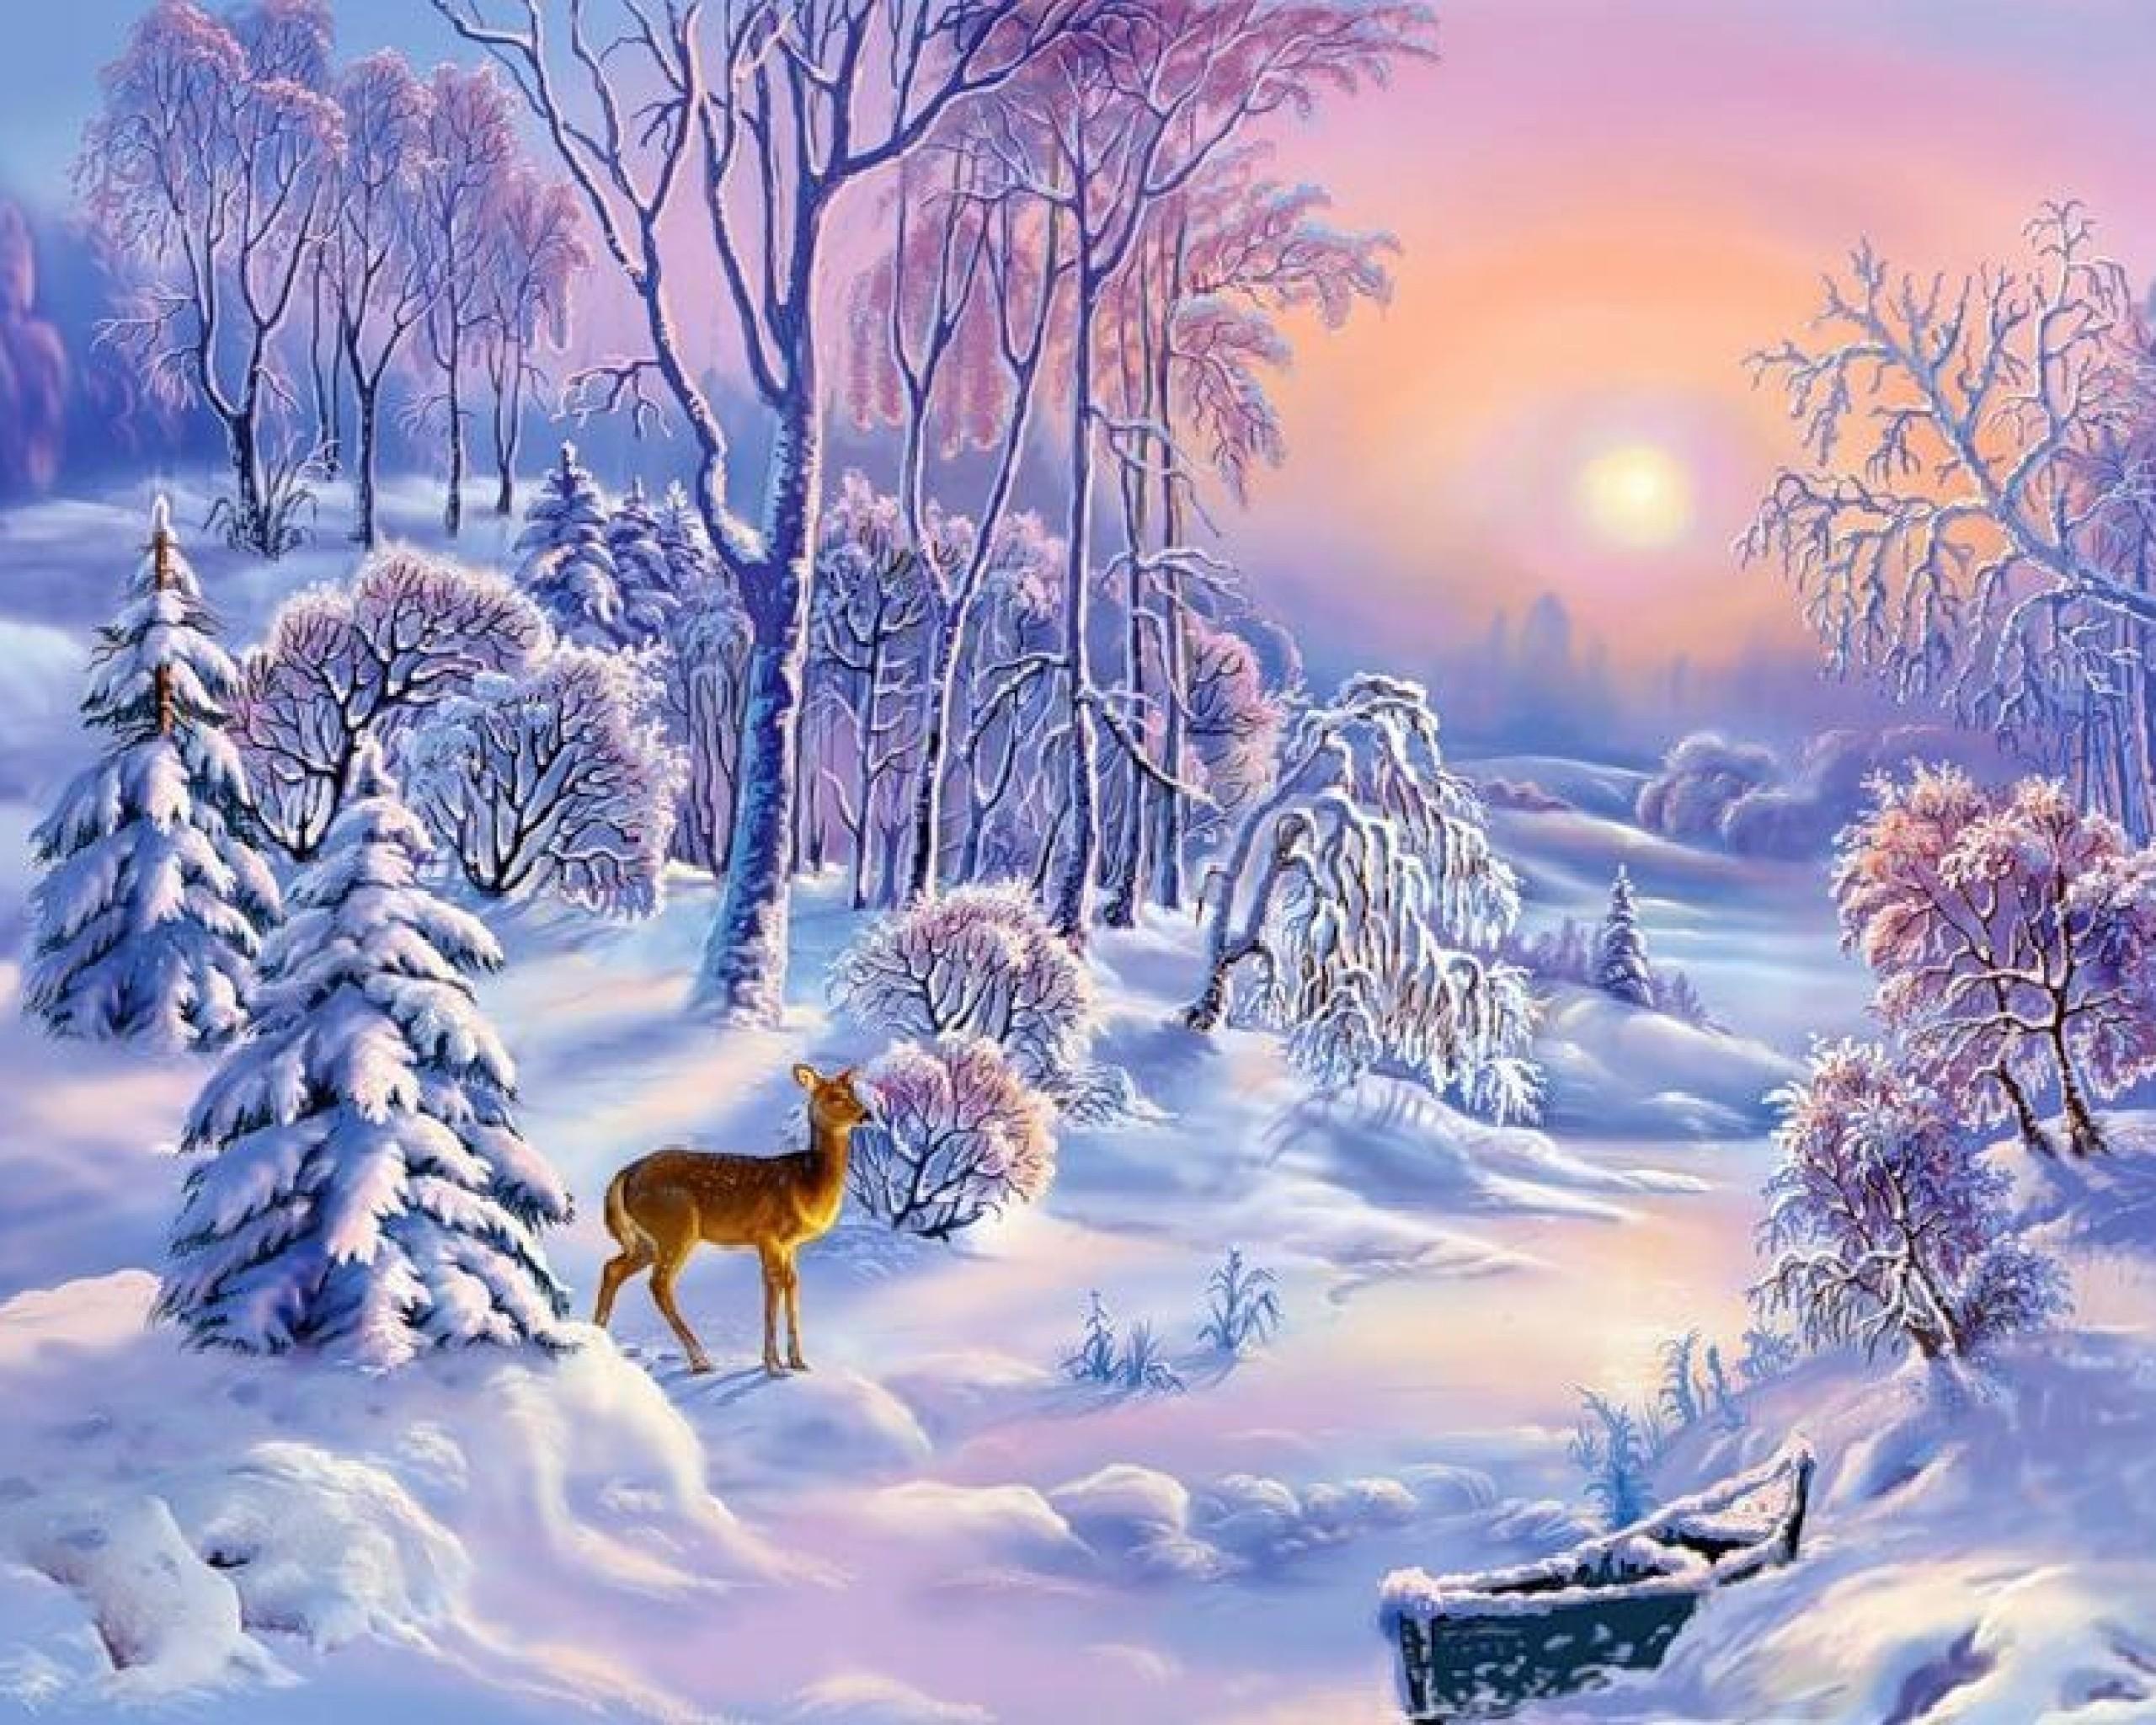 Res: 2560x2048, Christmas Deer Snowfall Wallpaper 2 - 2560 X 2048